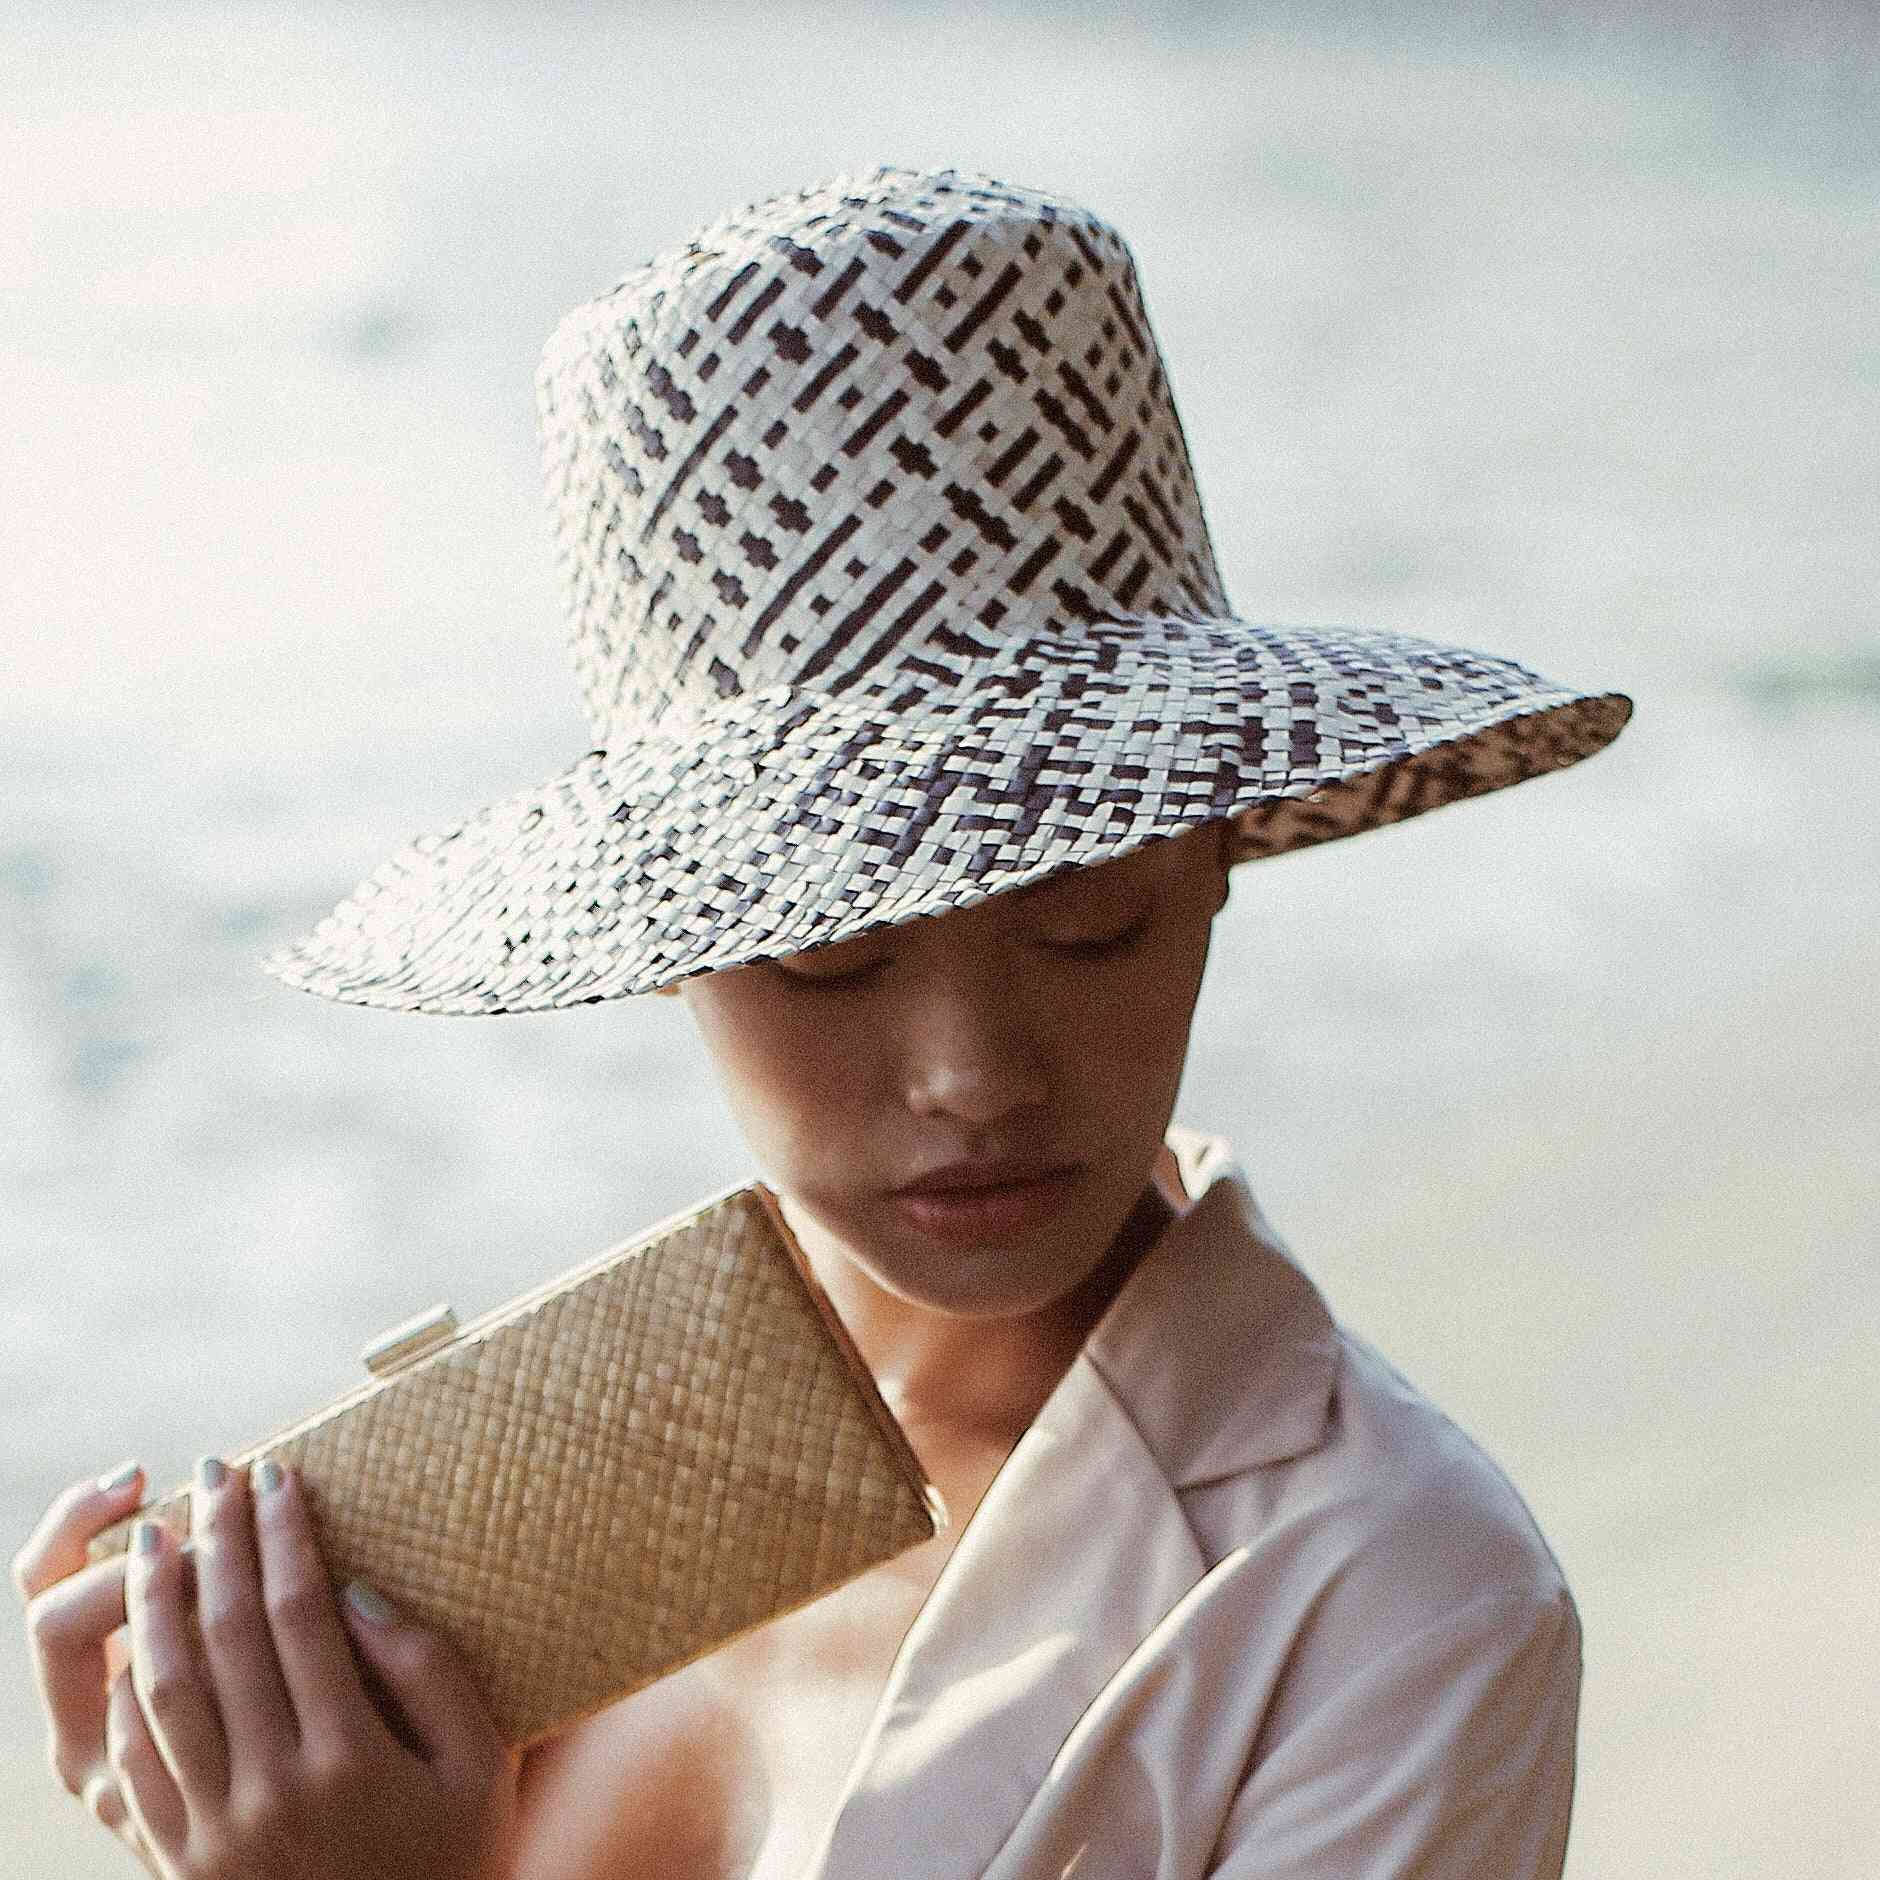 Lontar Straw Bucket Hat